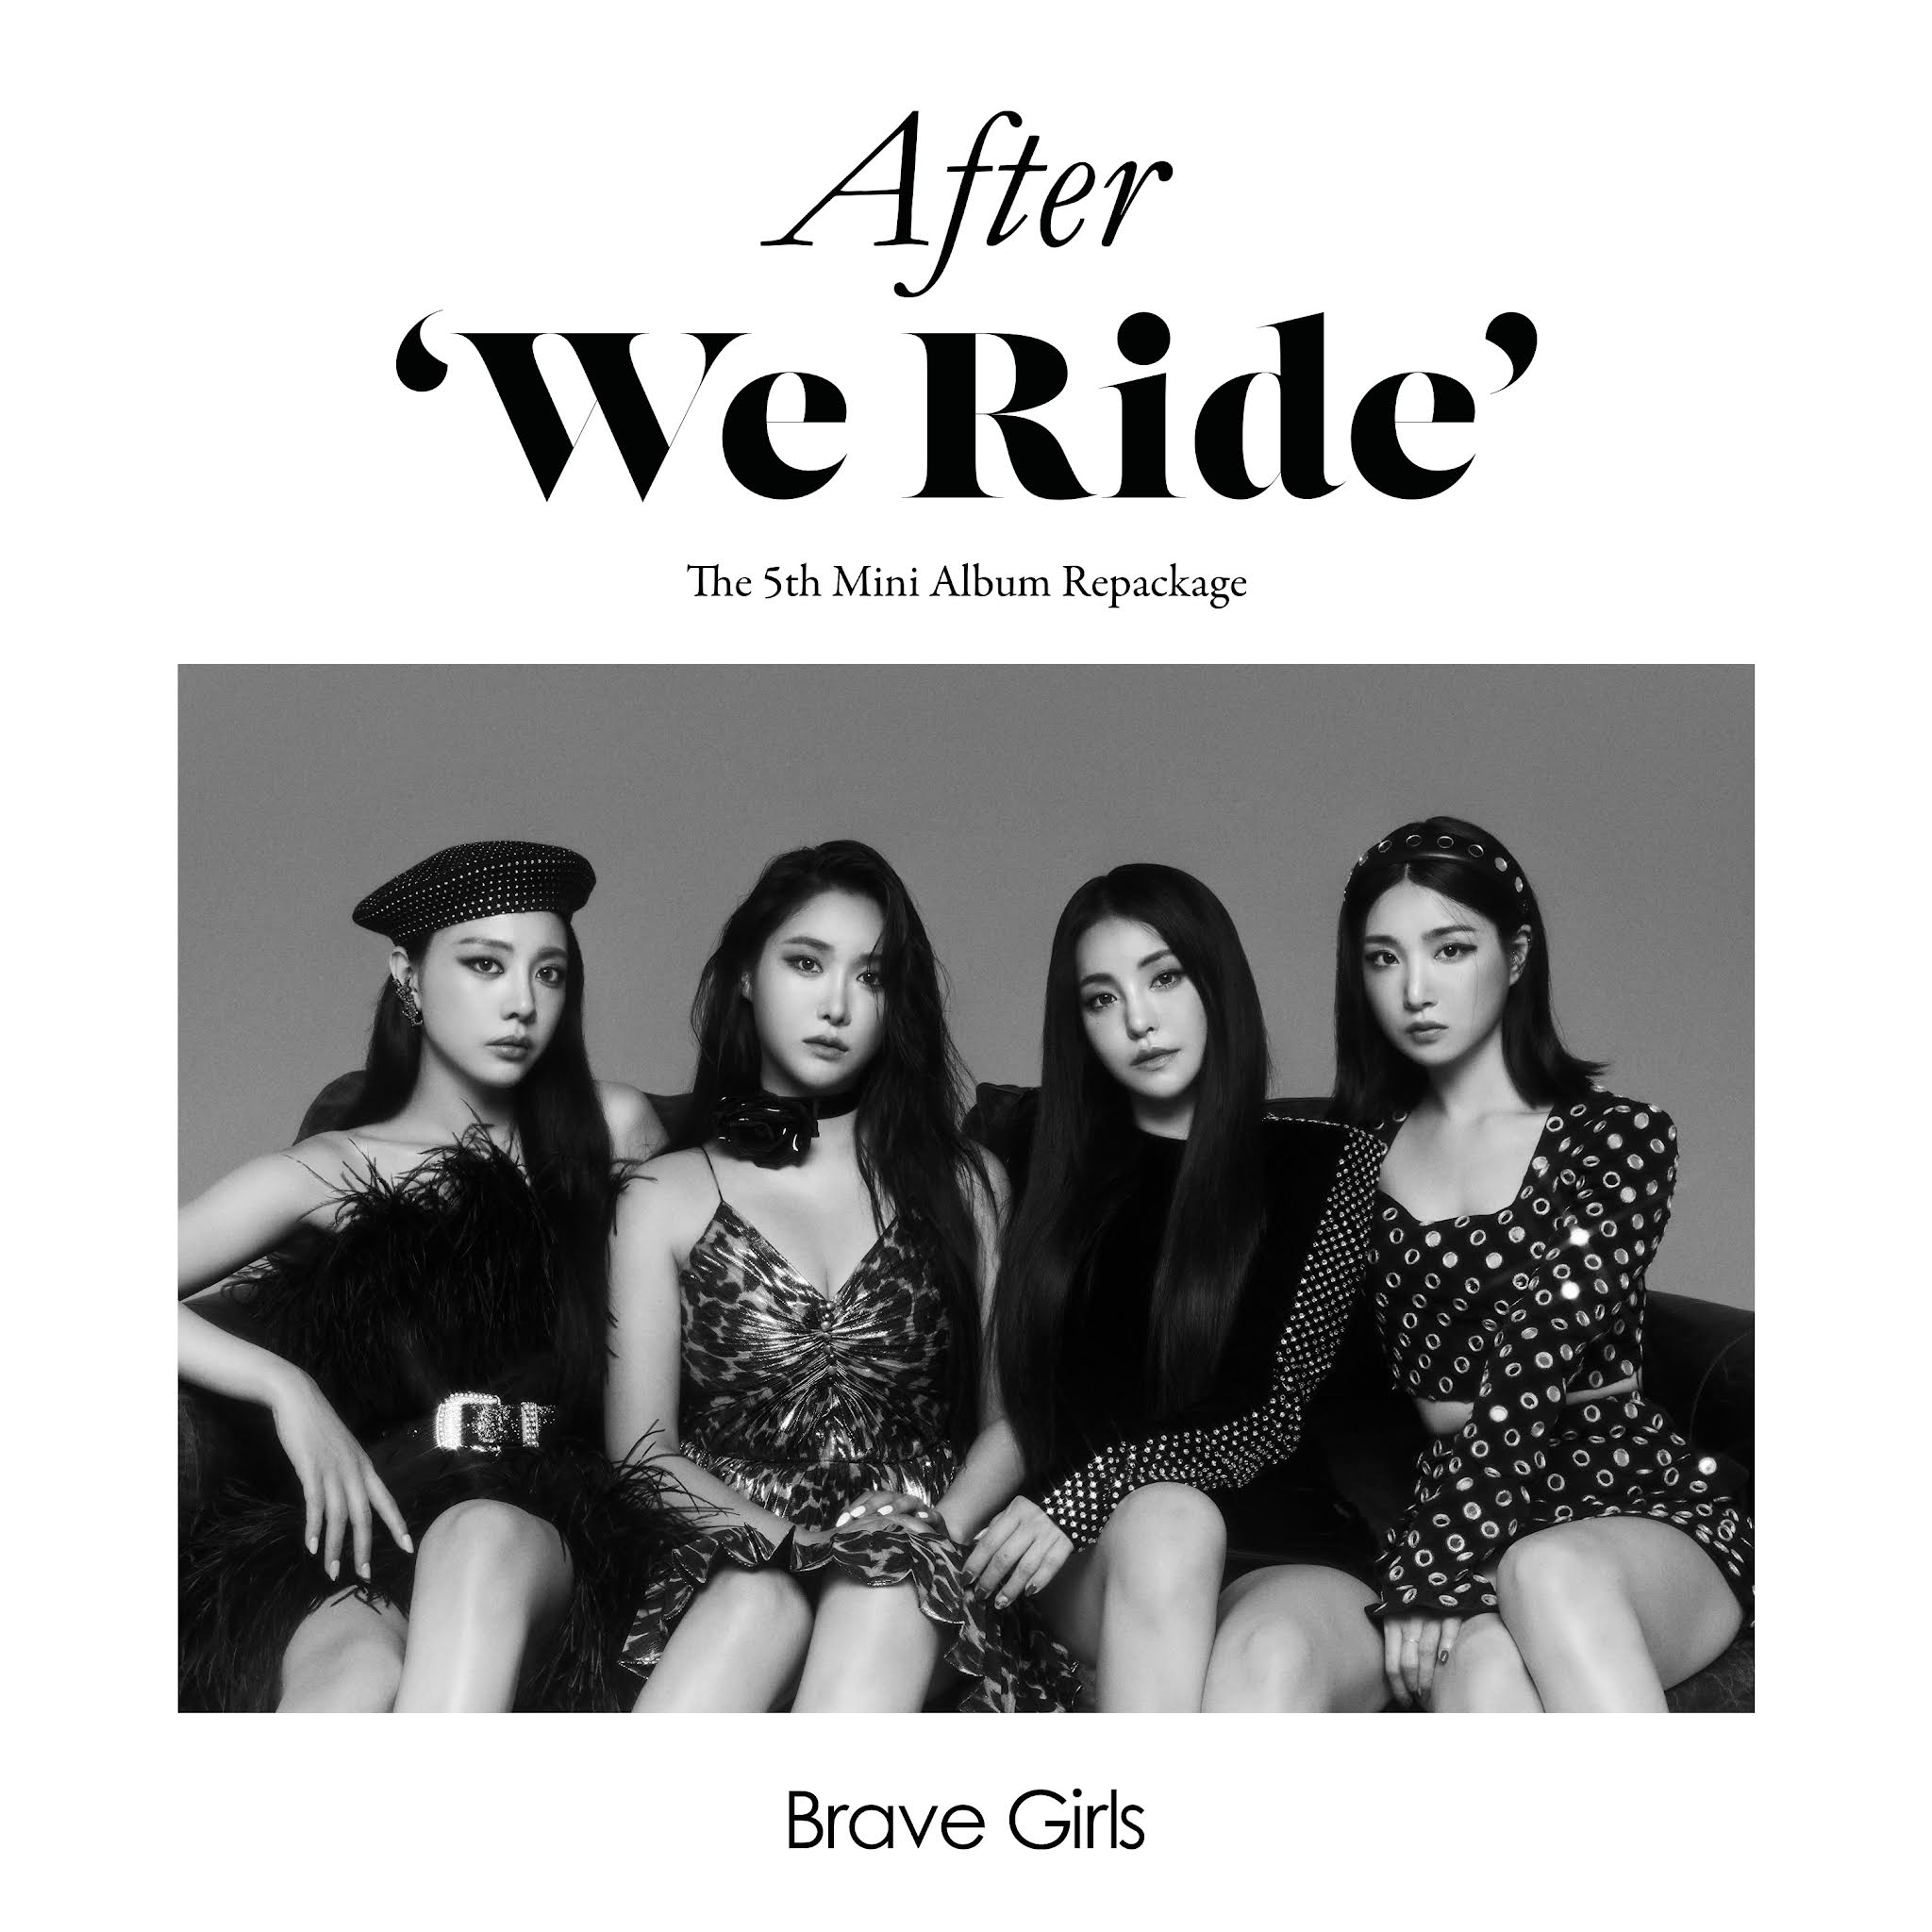 Brave Girls - After 'We Ride'